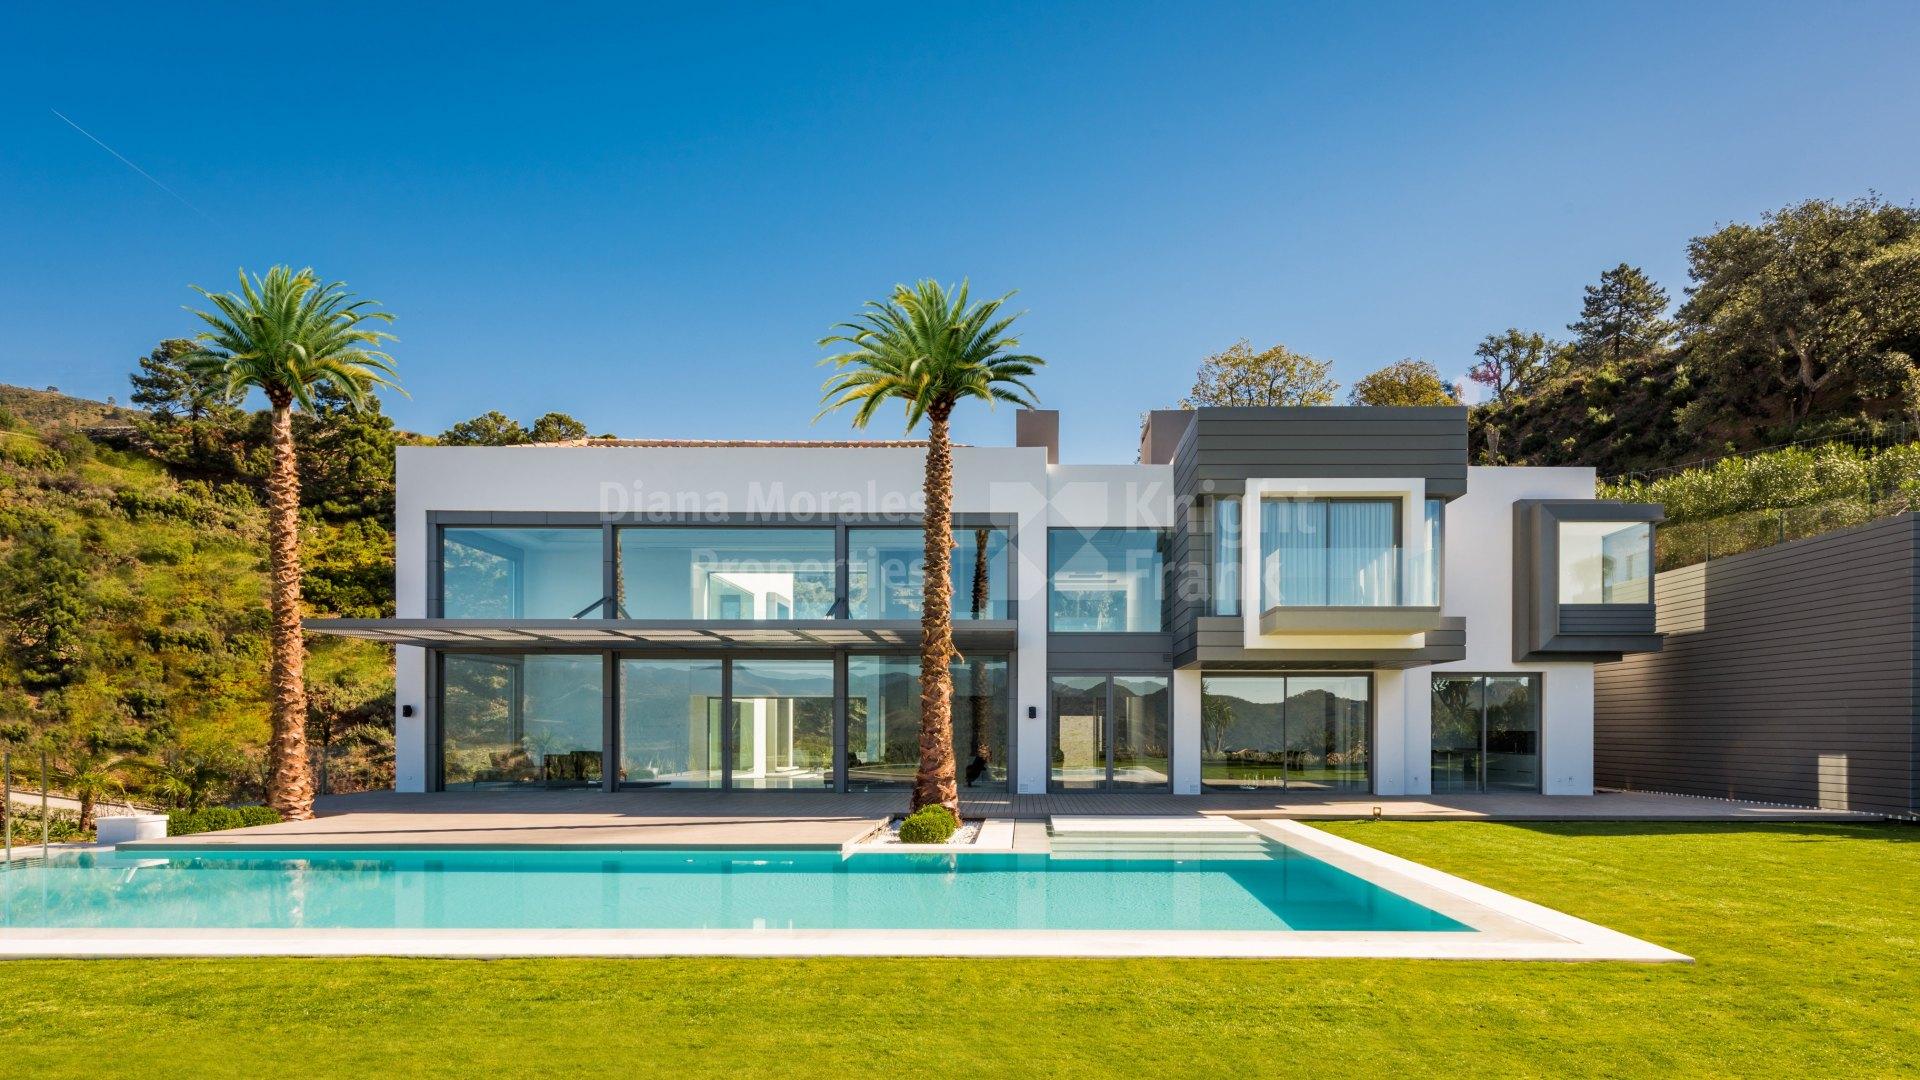 Marbella Club Property For Sale